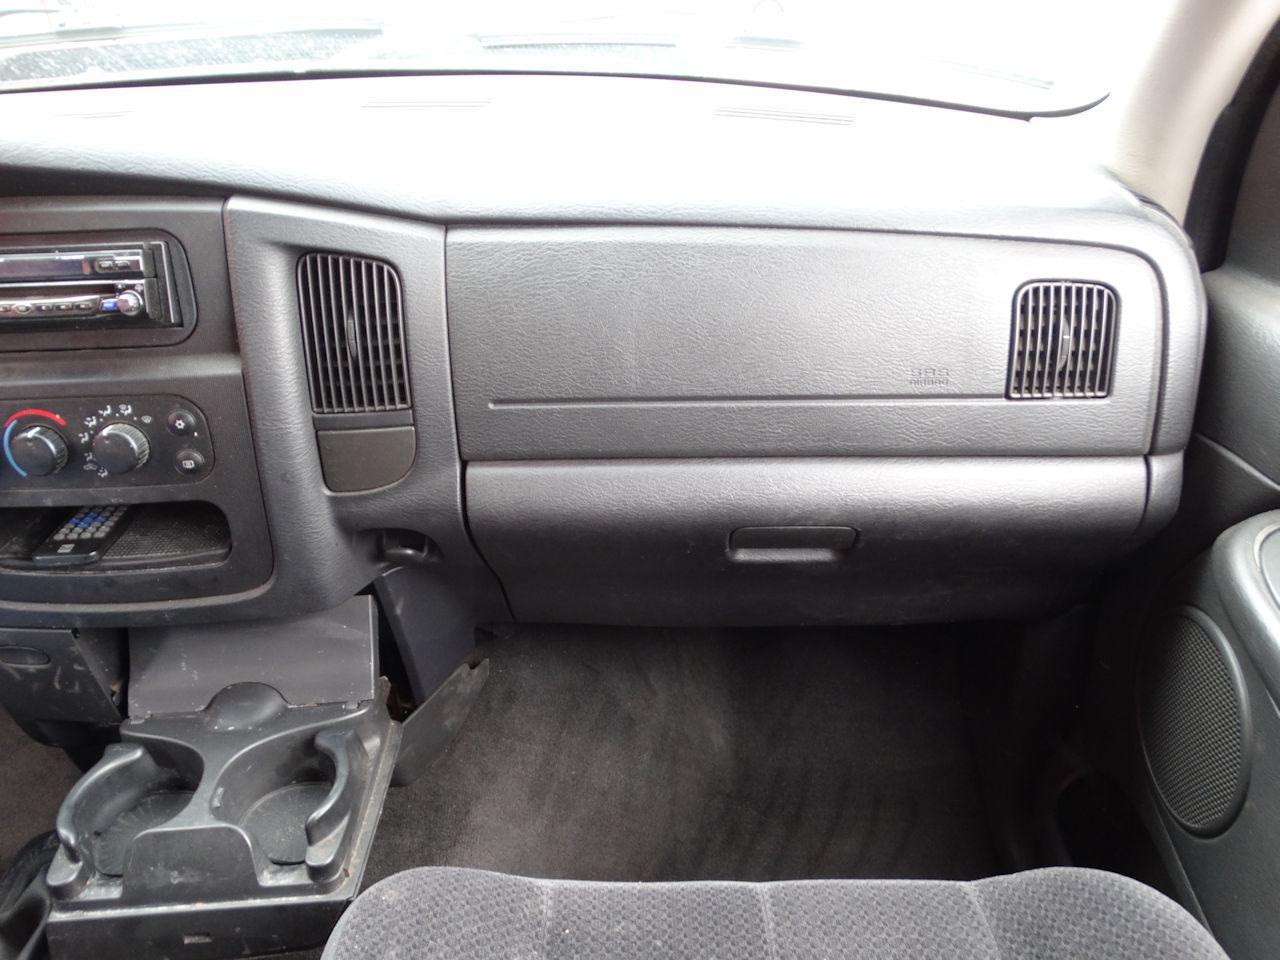 2005 Dodge Ram 75